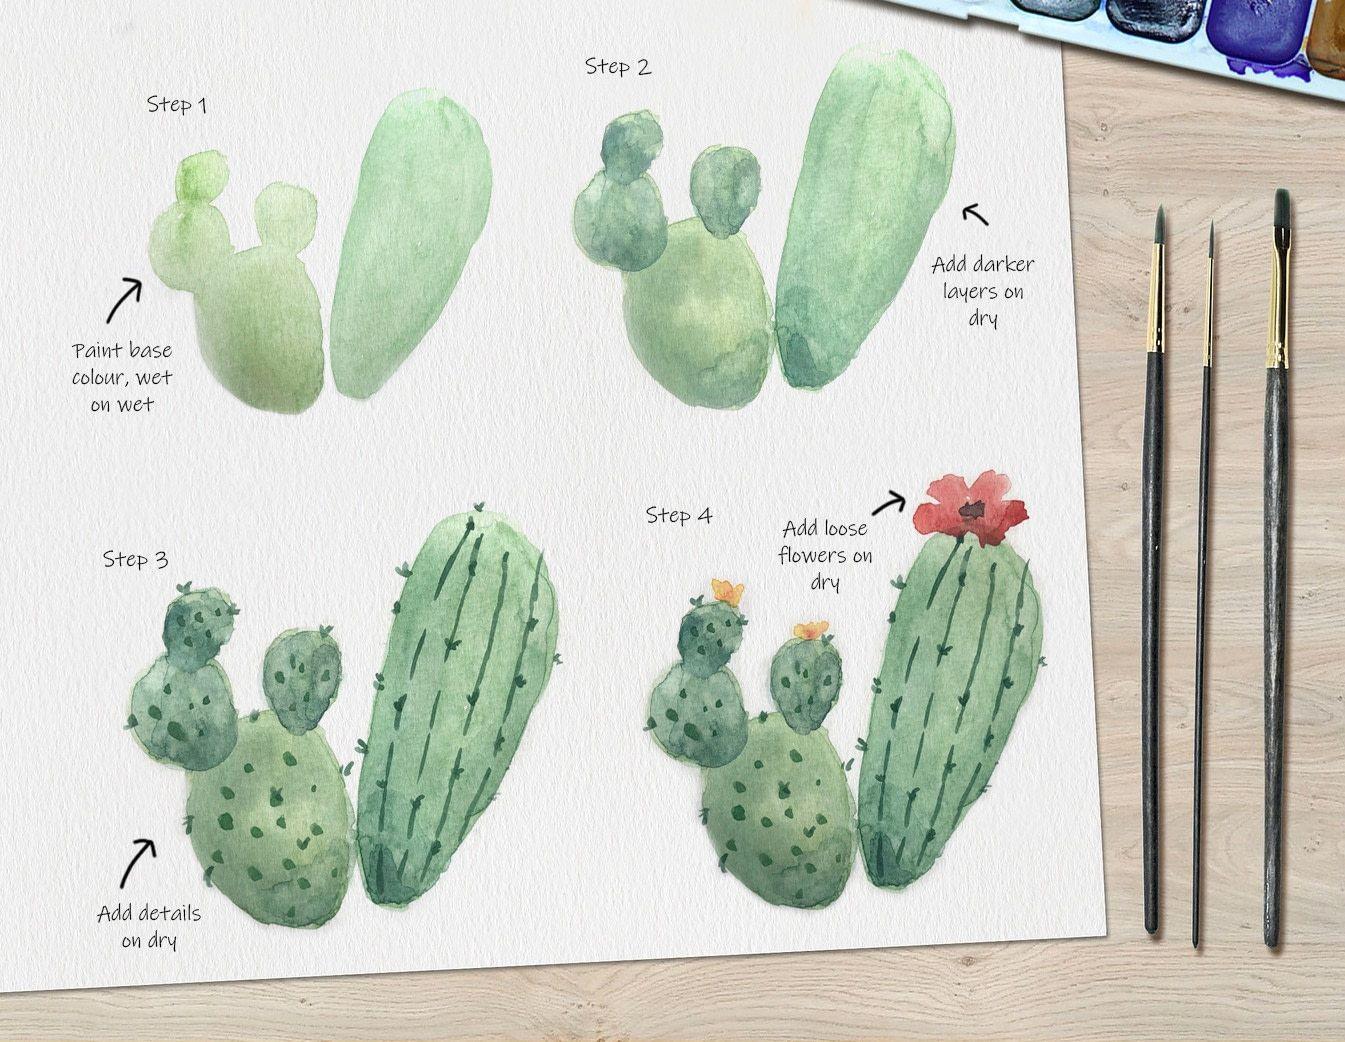 Cactus Watercolour Tutorial In 2020 Watercolour Tutorials